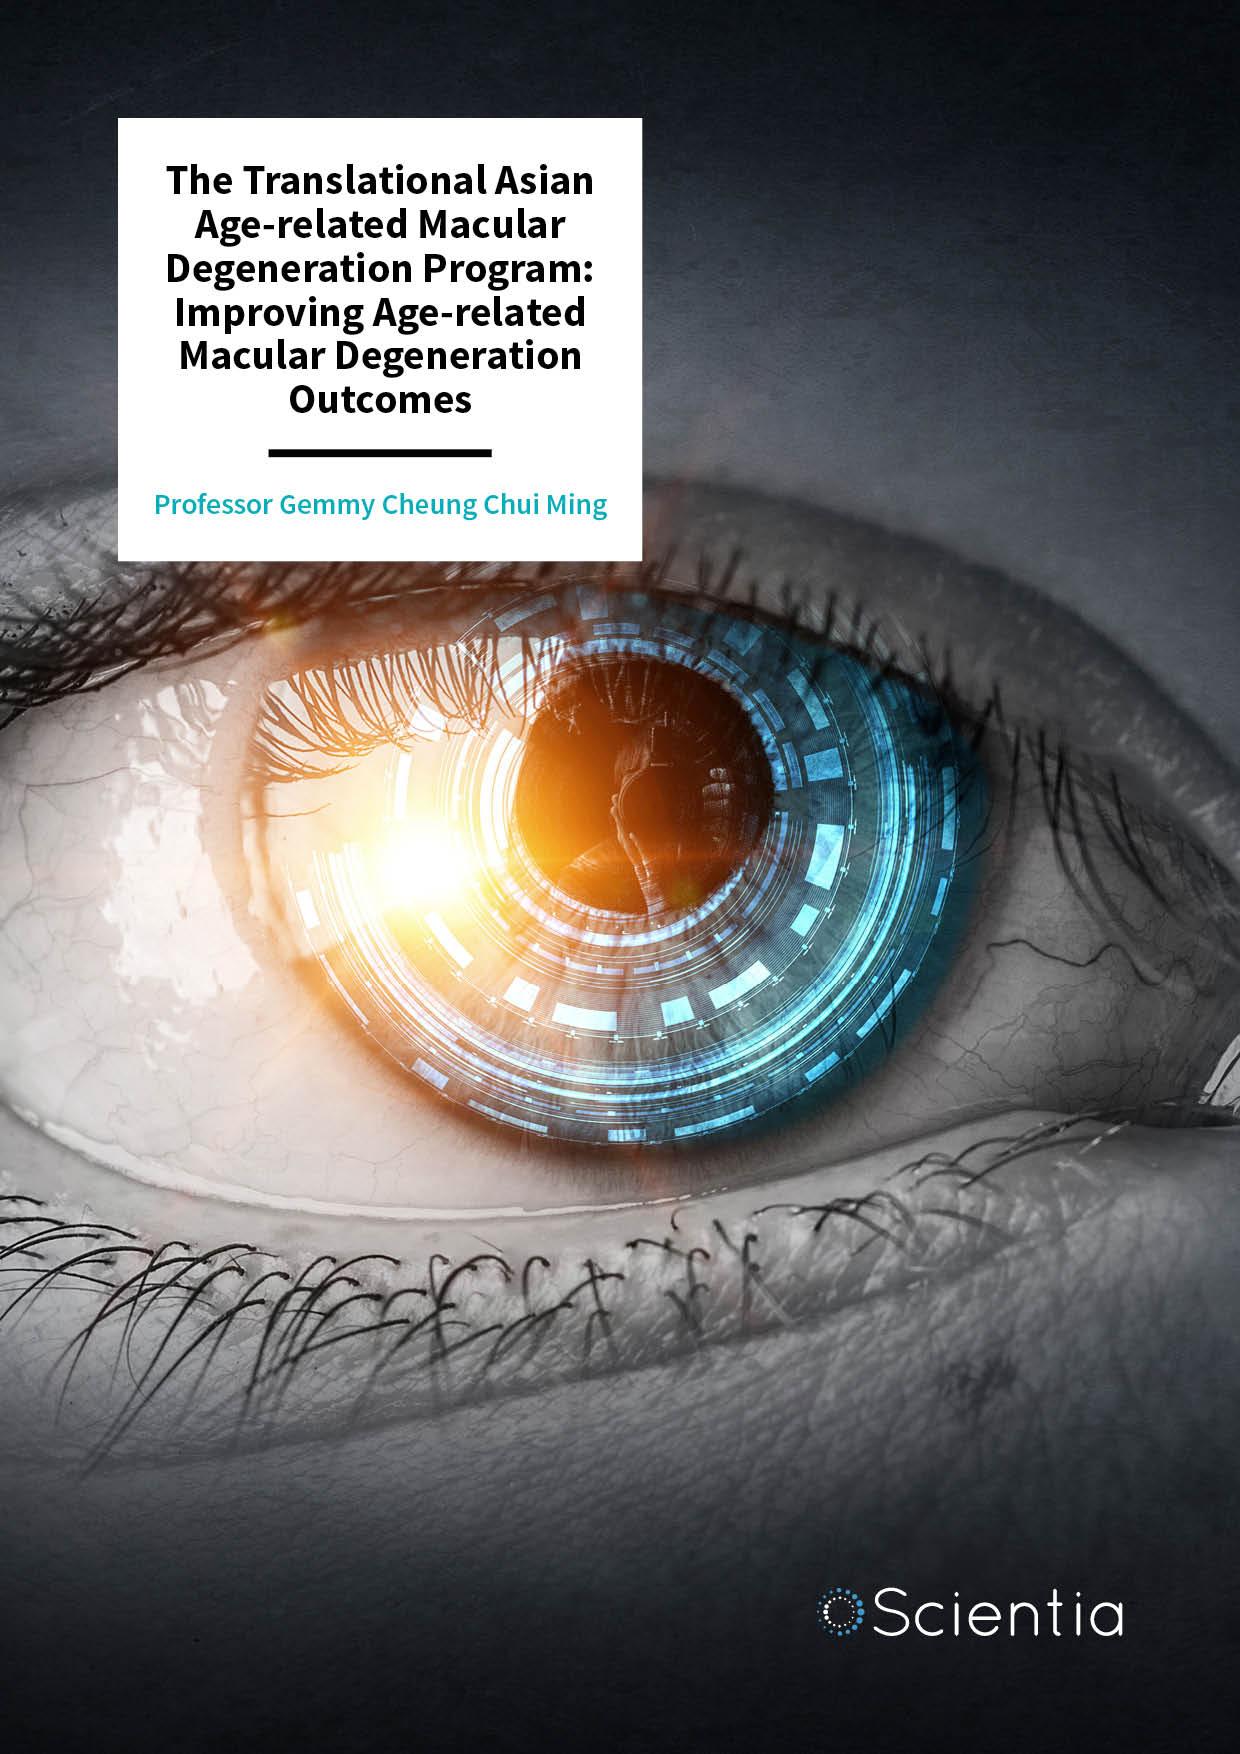 Professor Gemmy Cheung – The Translational Asian Age-related Macular Degeneration Program: Improving Age-related Macular Degeneration Outcomes